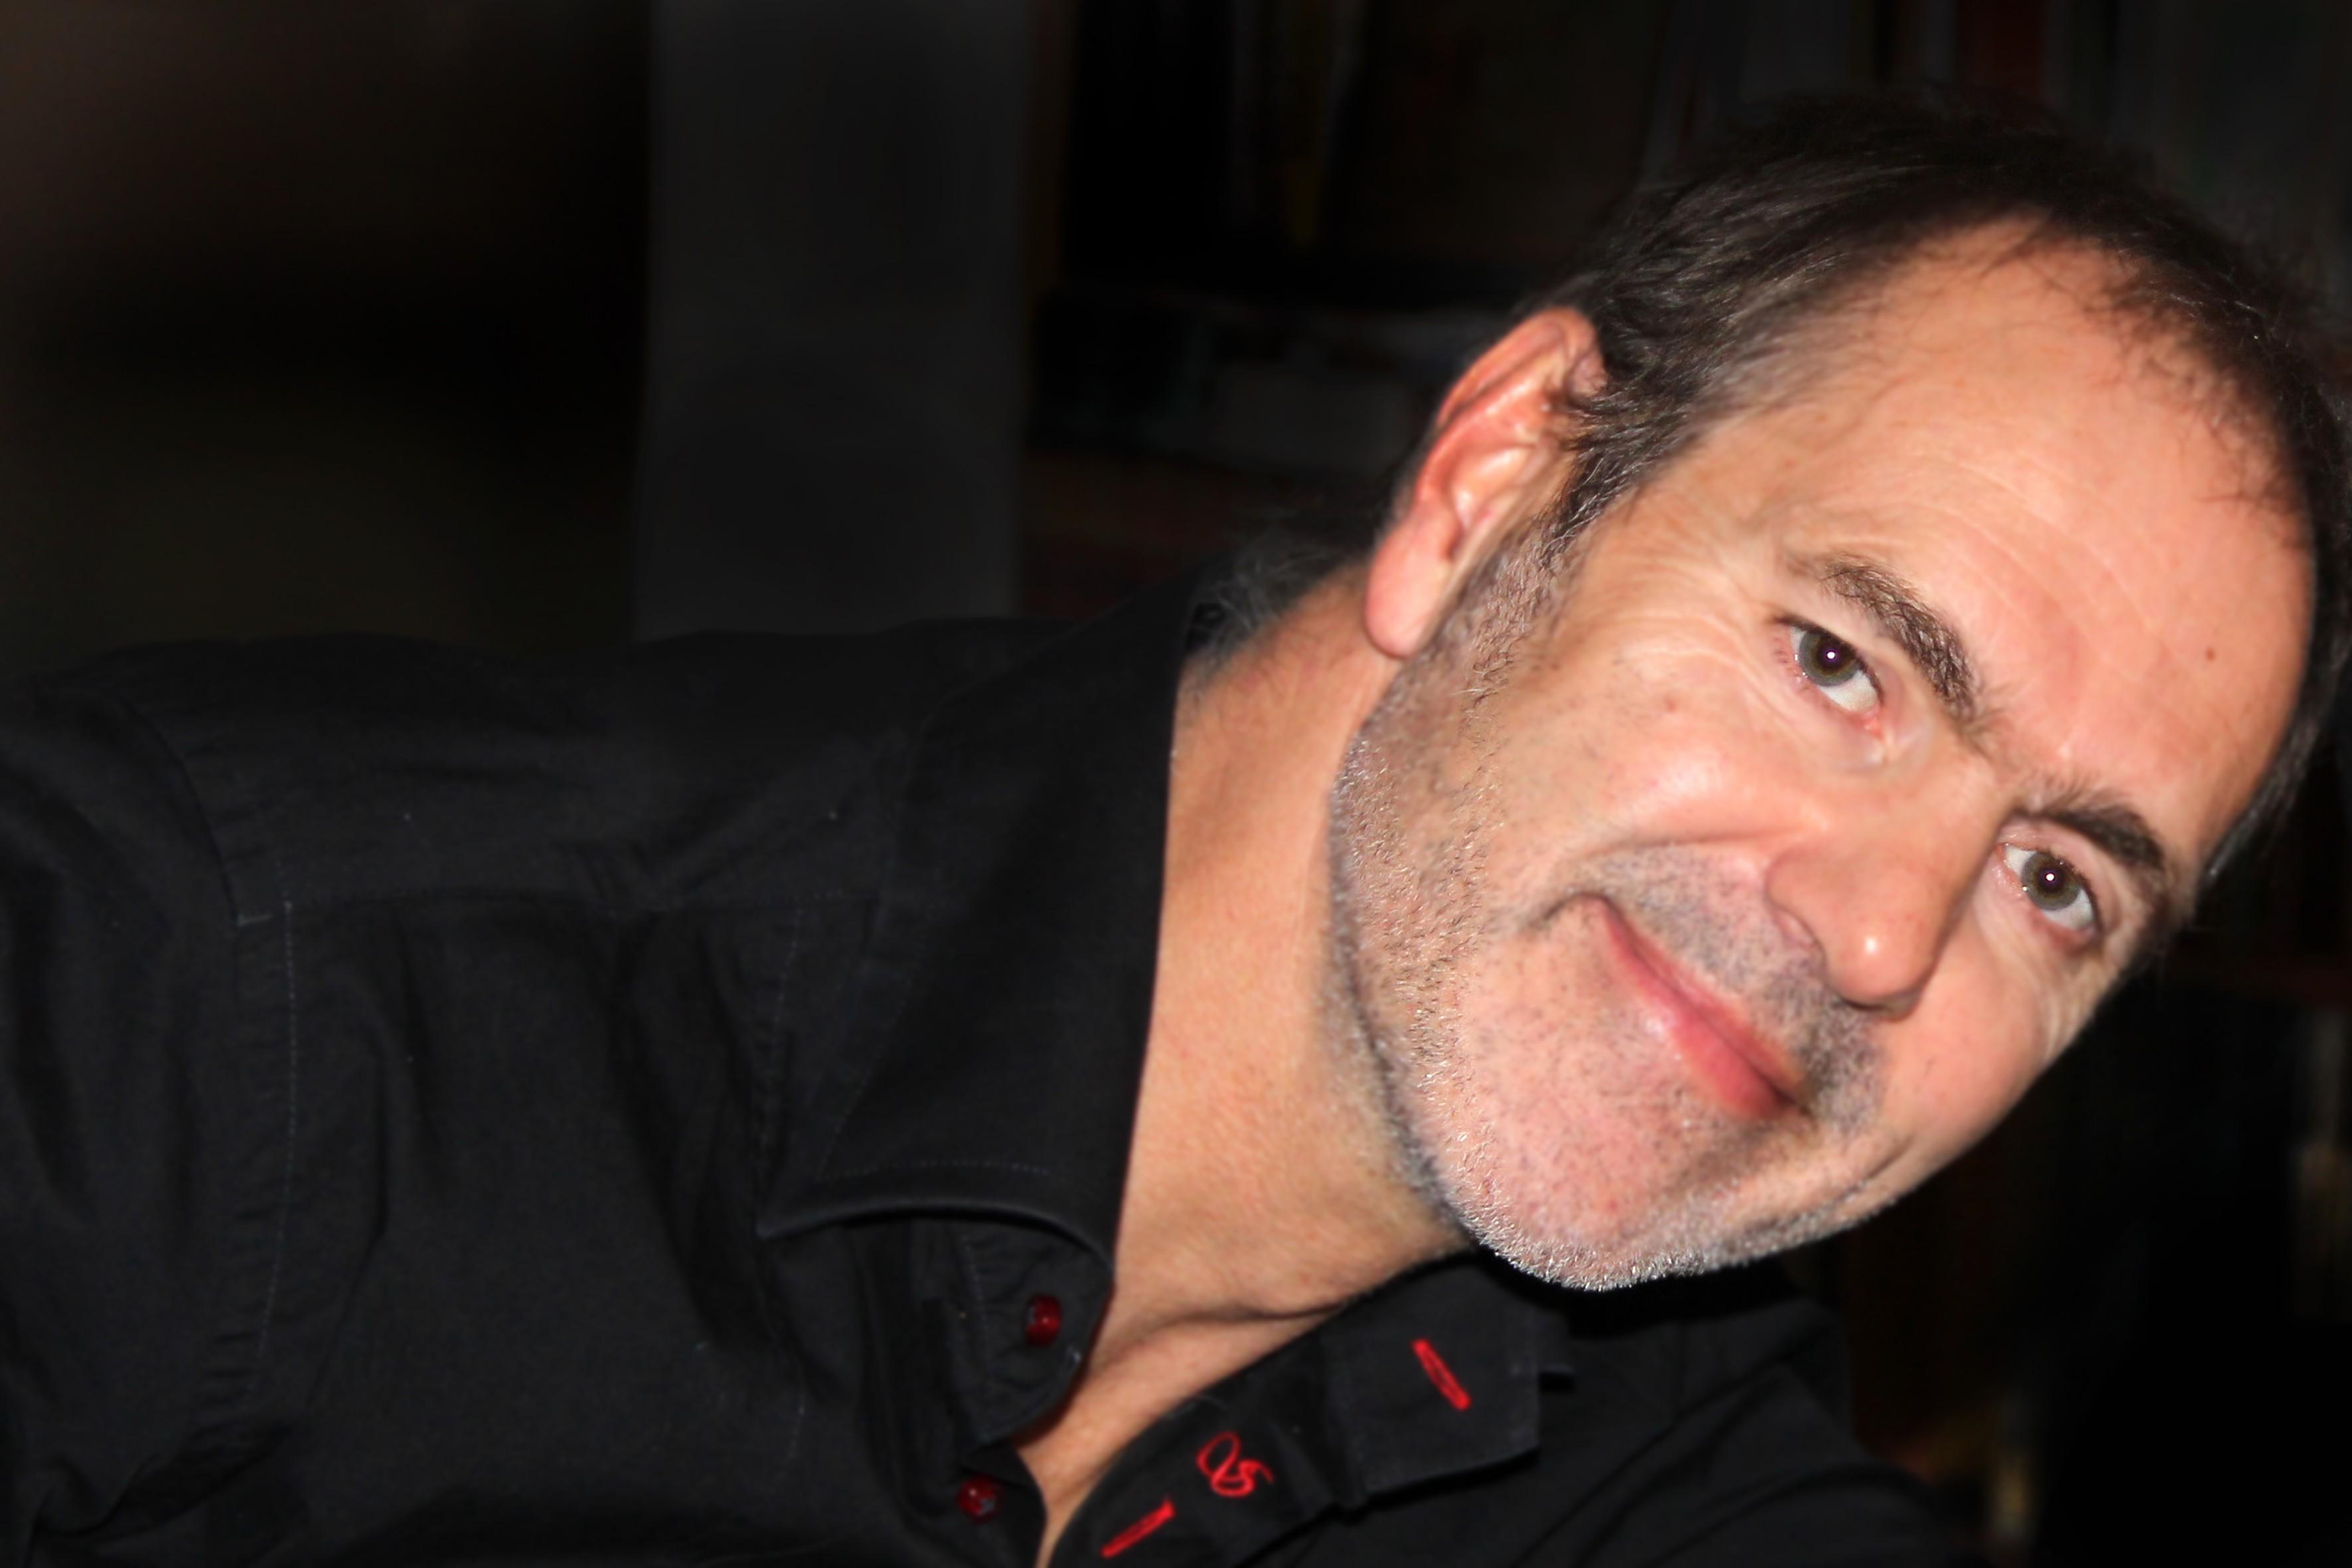 Didier Tresgots